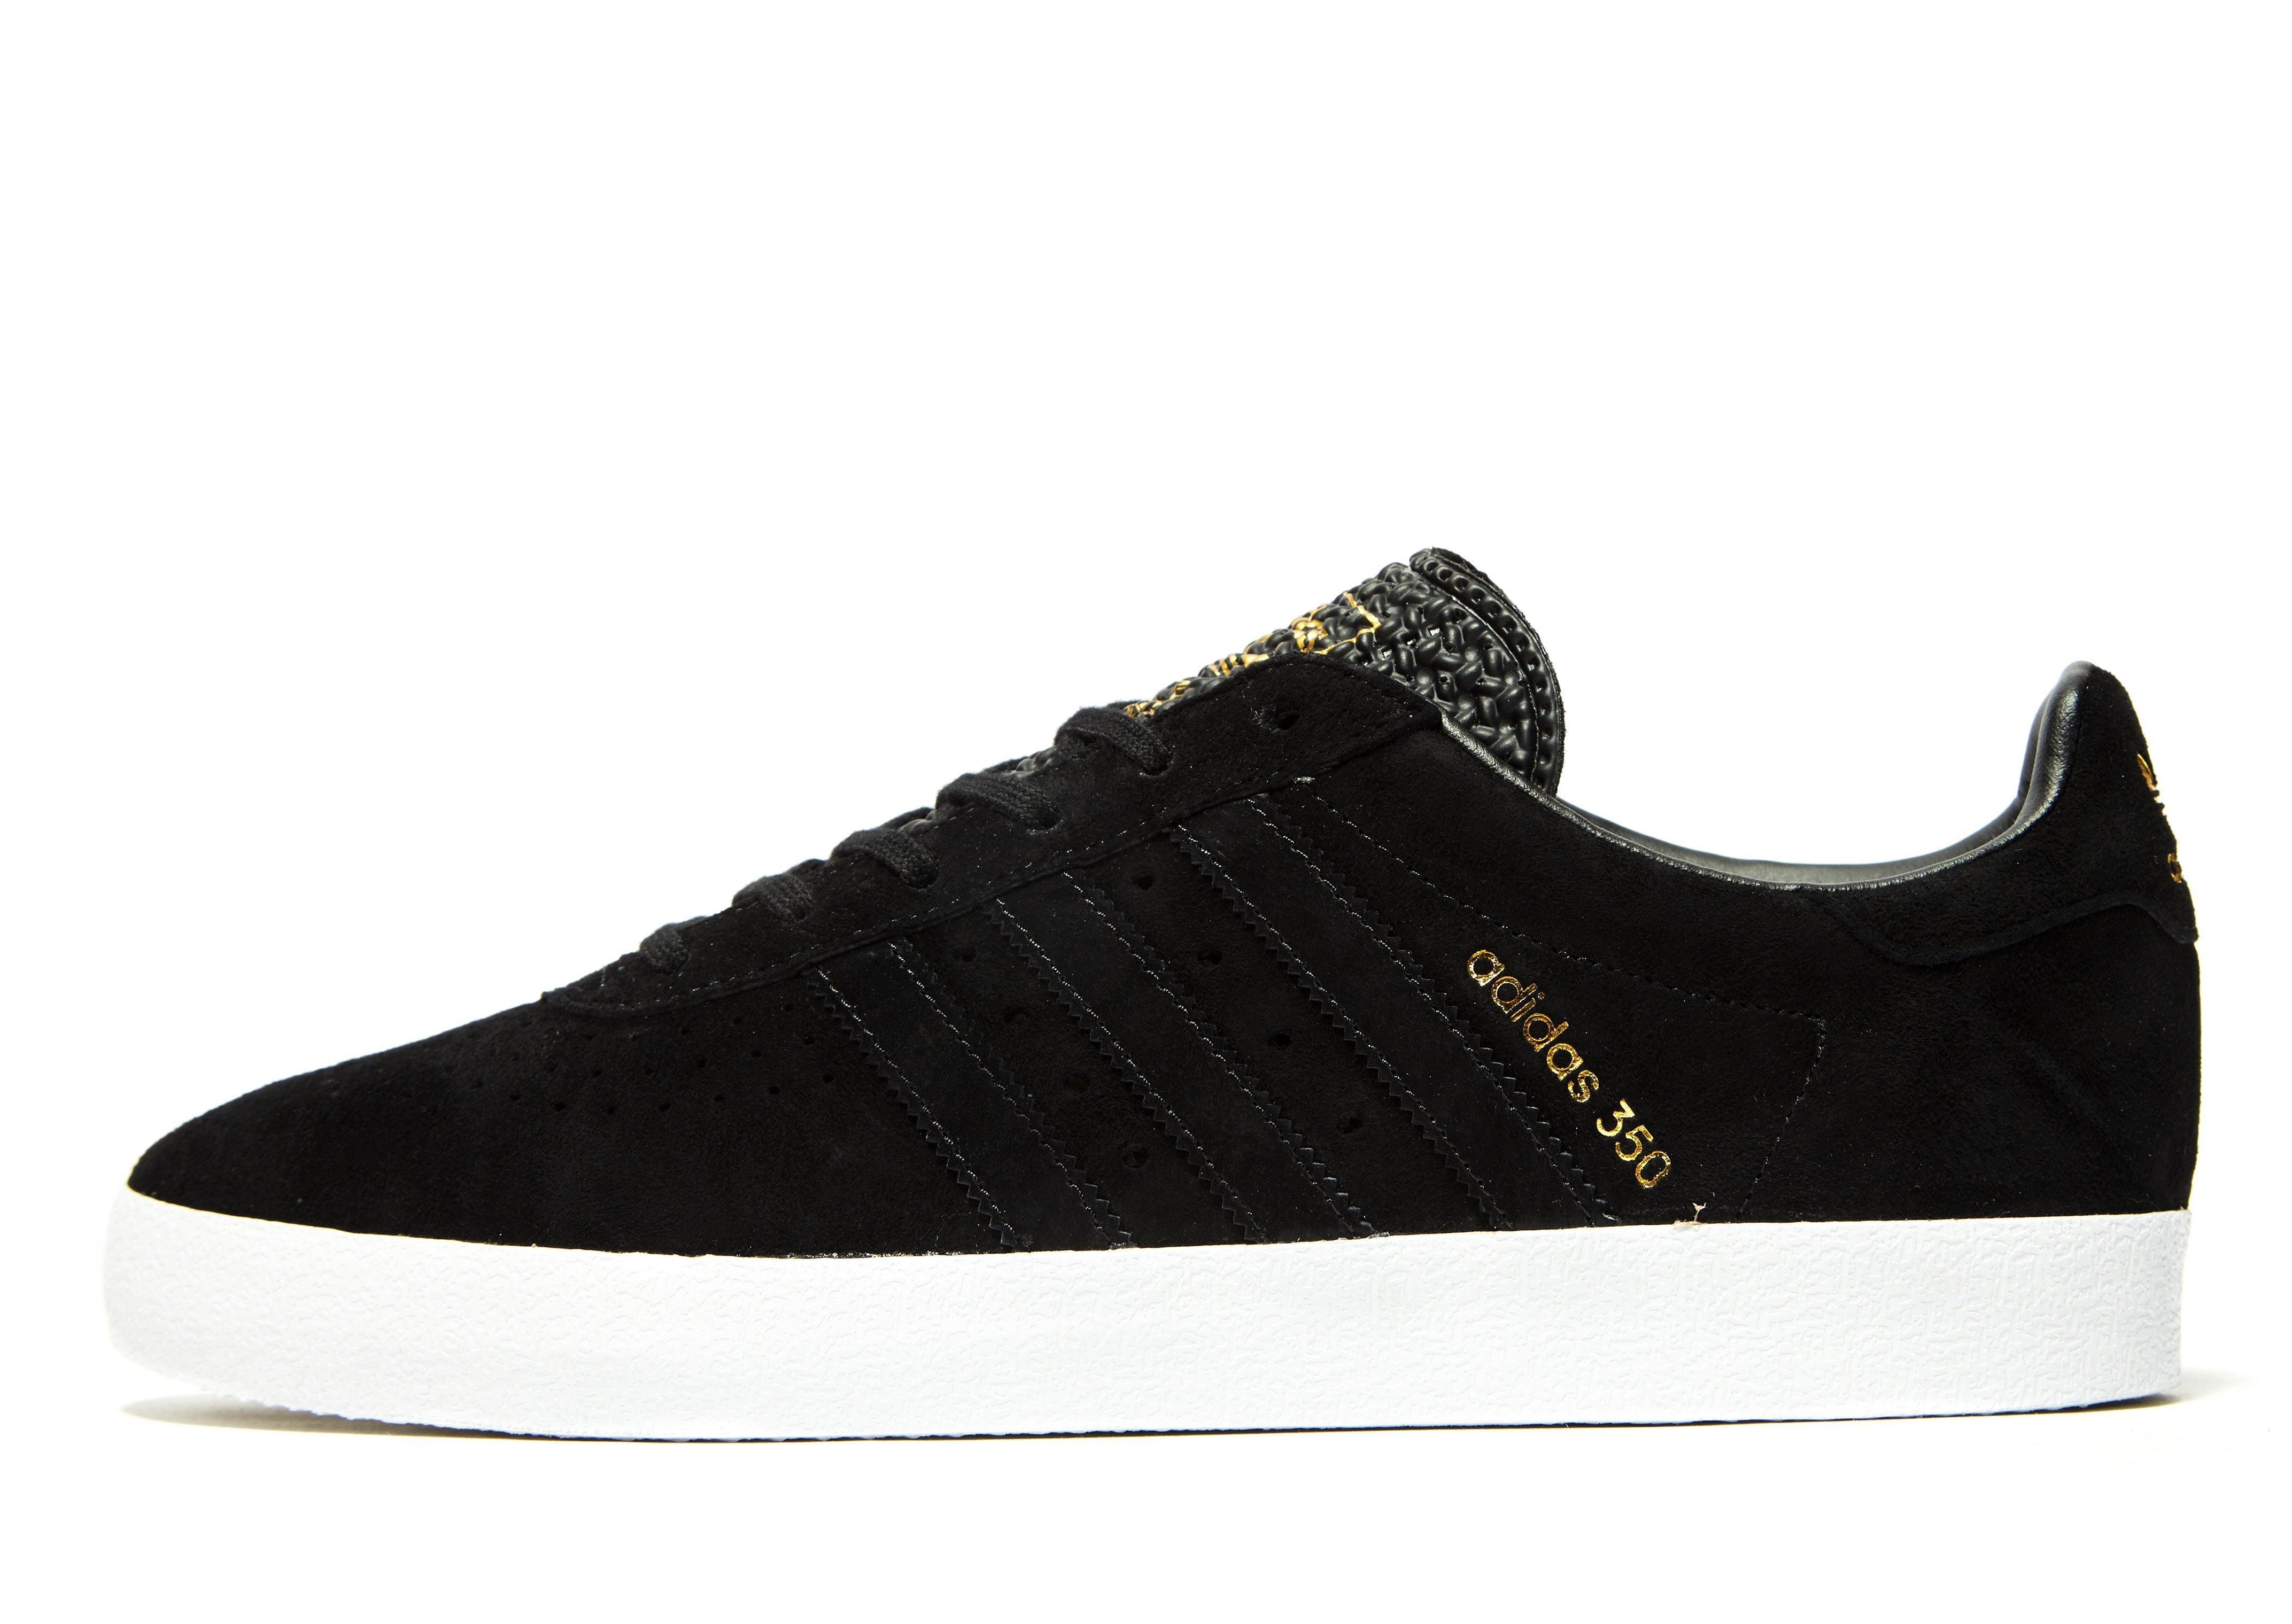 adidas Originals Suede 350 in Black